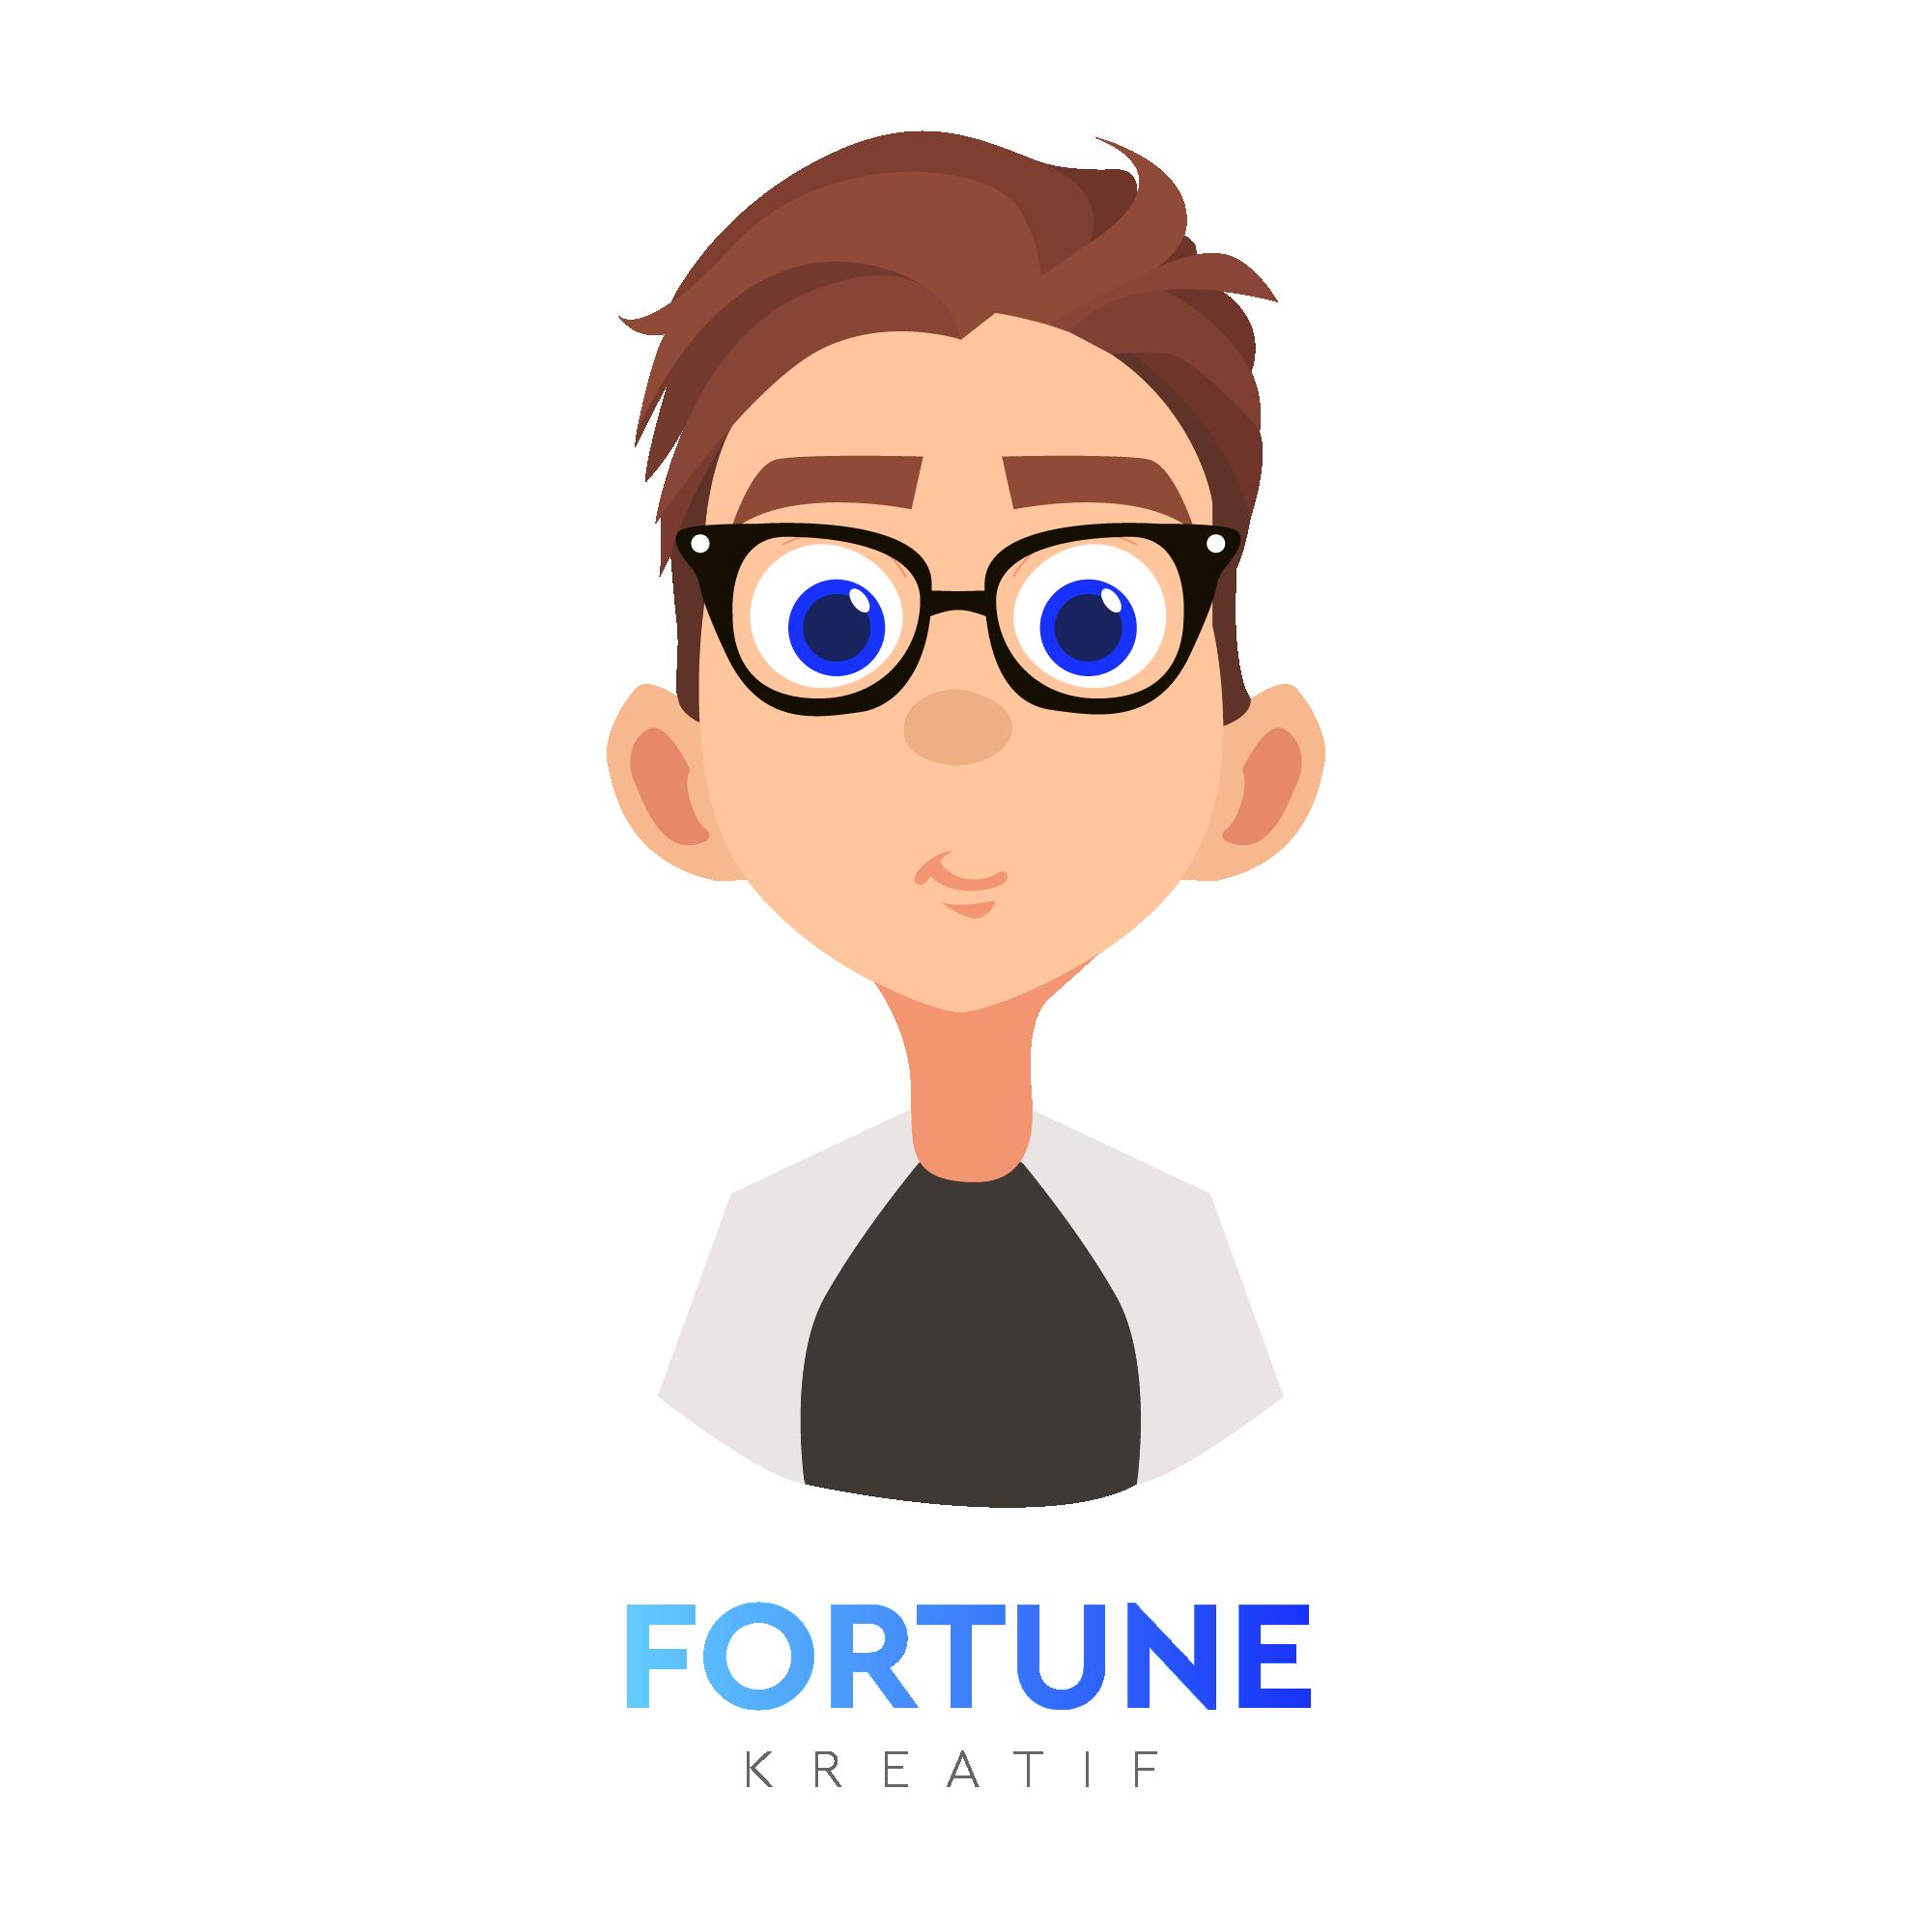 Fortune Kreatif Indonesia